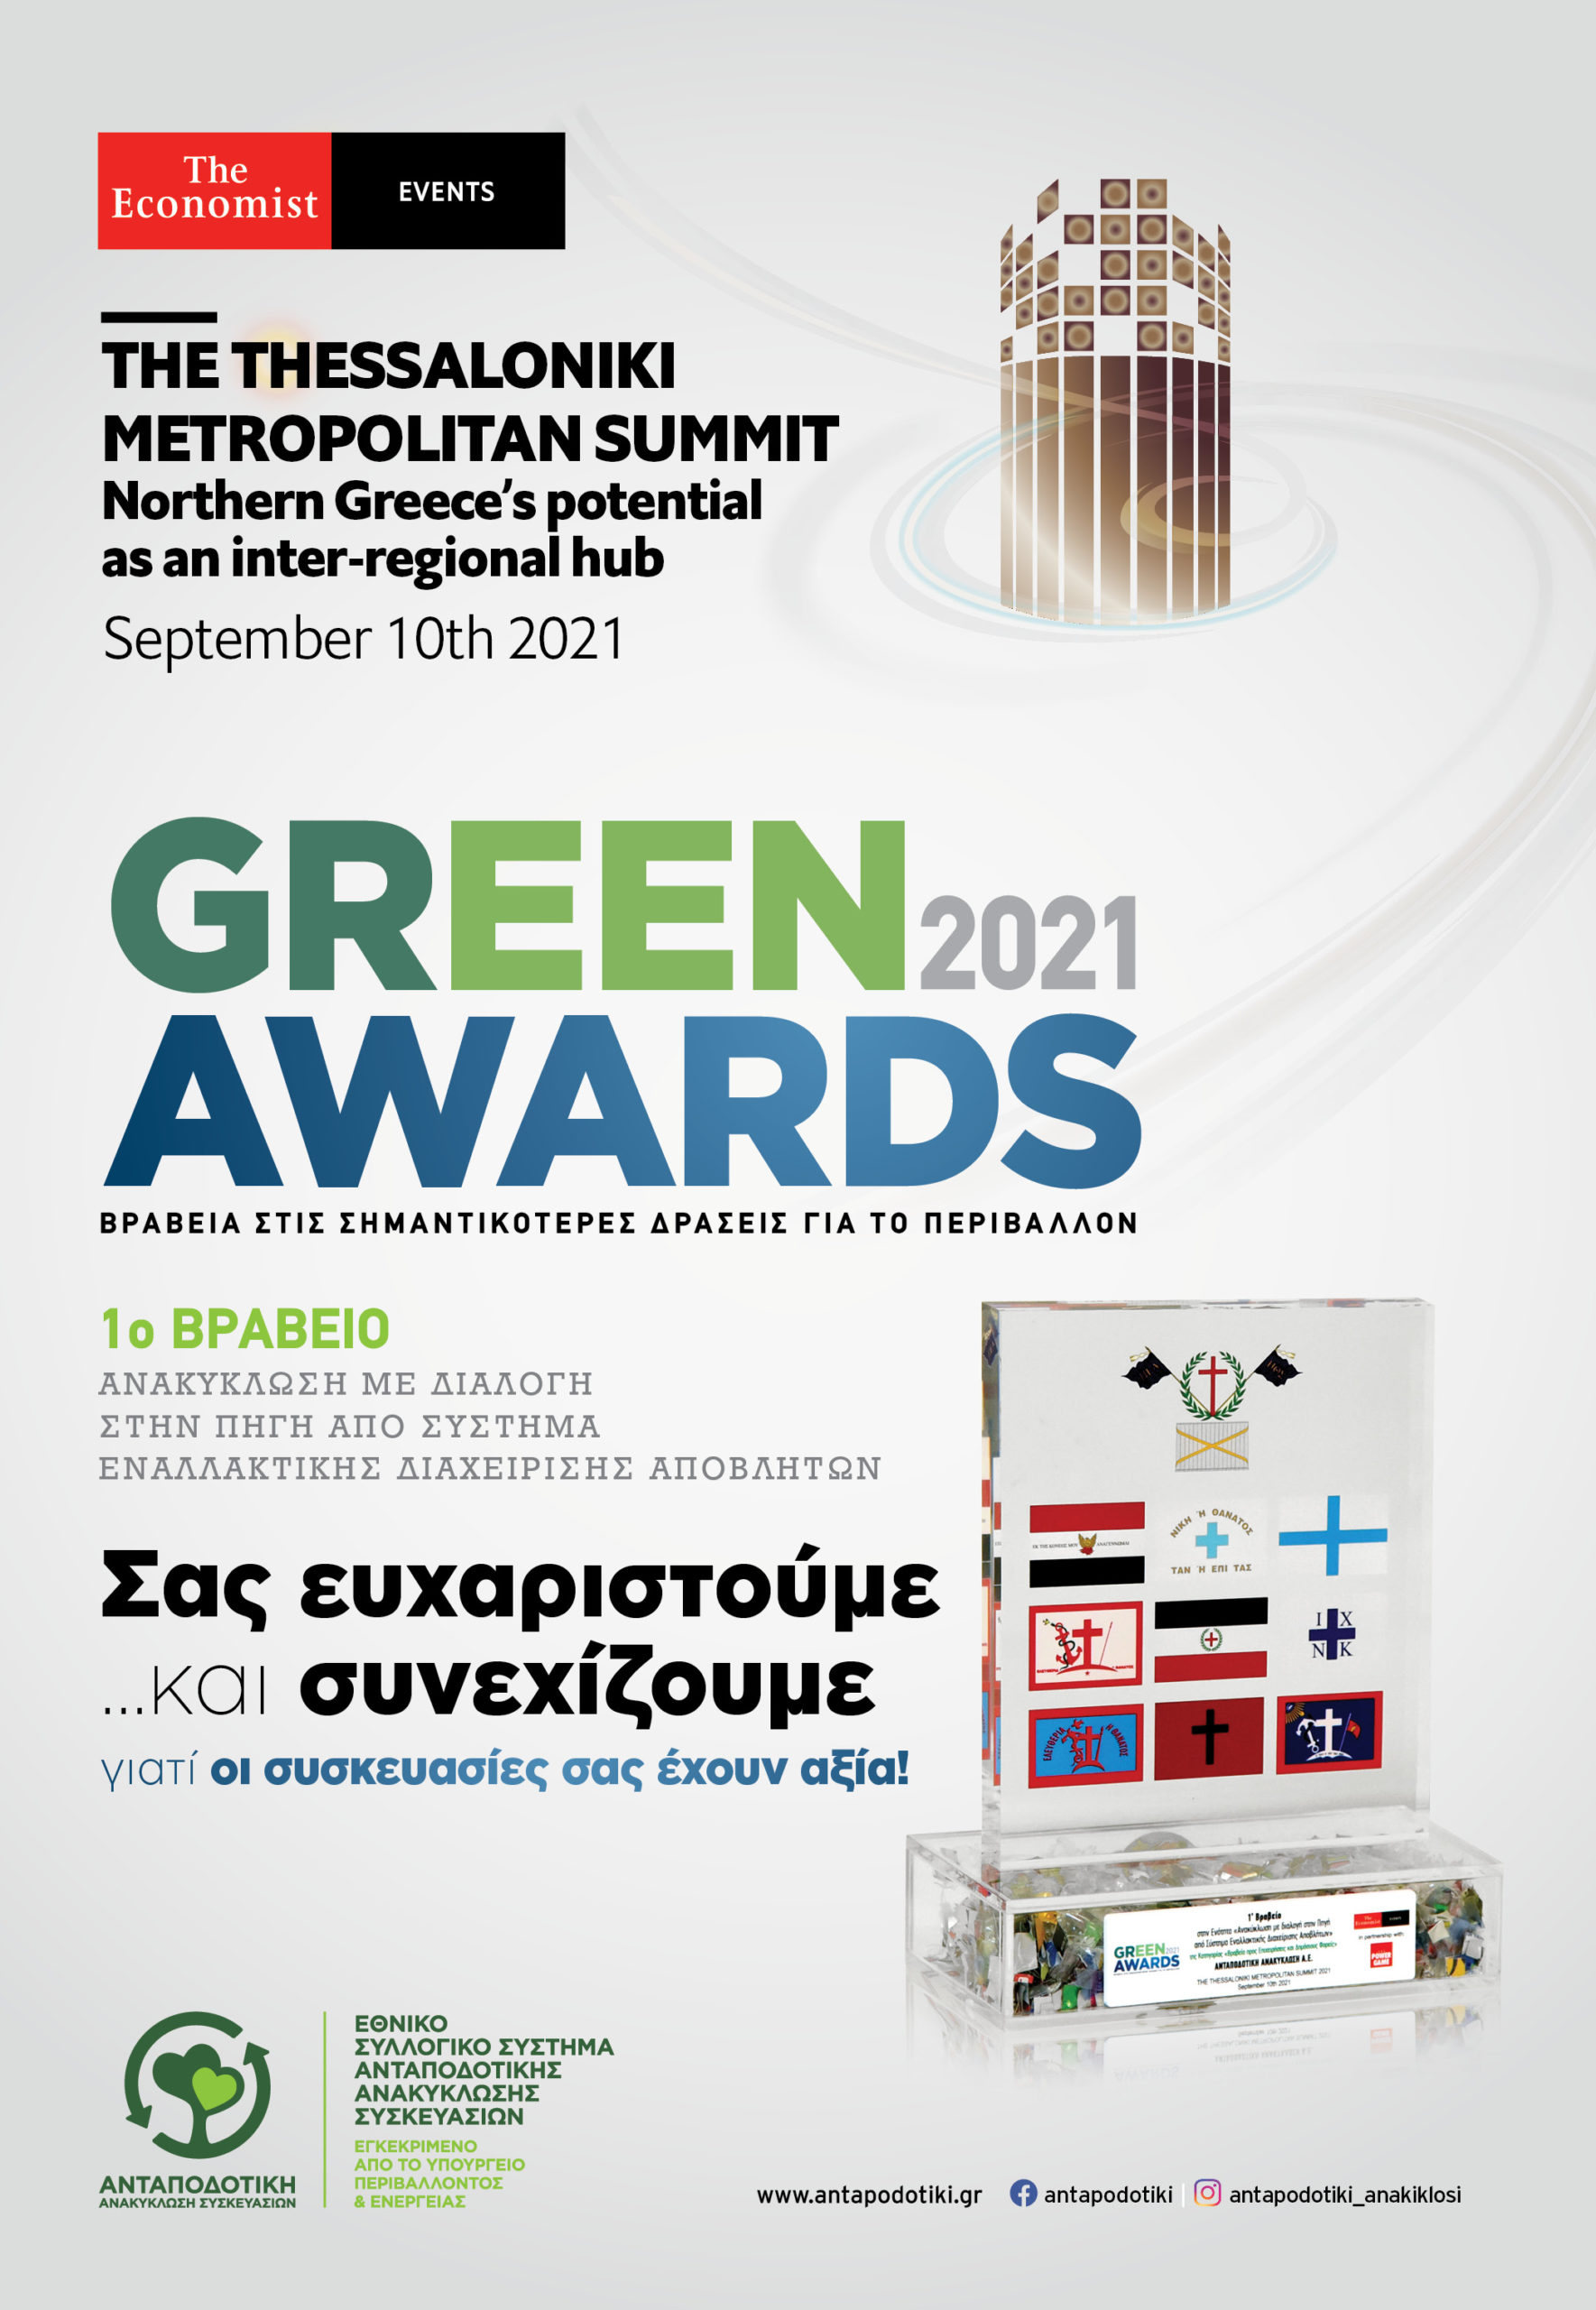 Green Awards 2021 ΑΝΤΑΠΟΔΟΤΙΚΗ ΑΝΑΚΥΚΛΩΣΗ